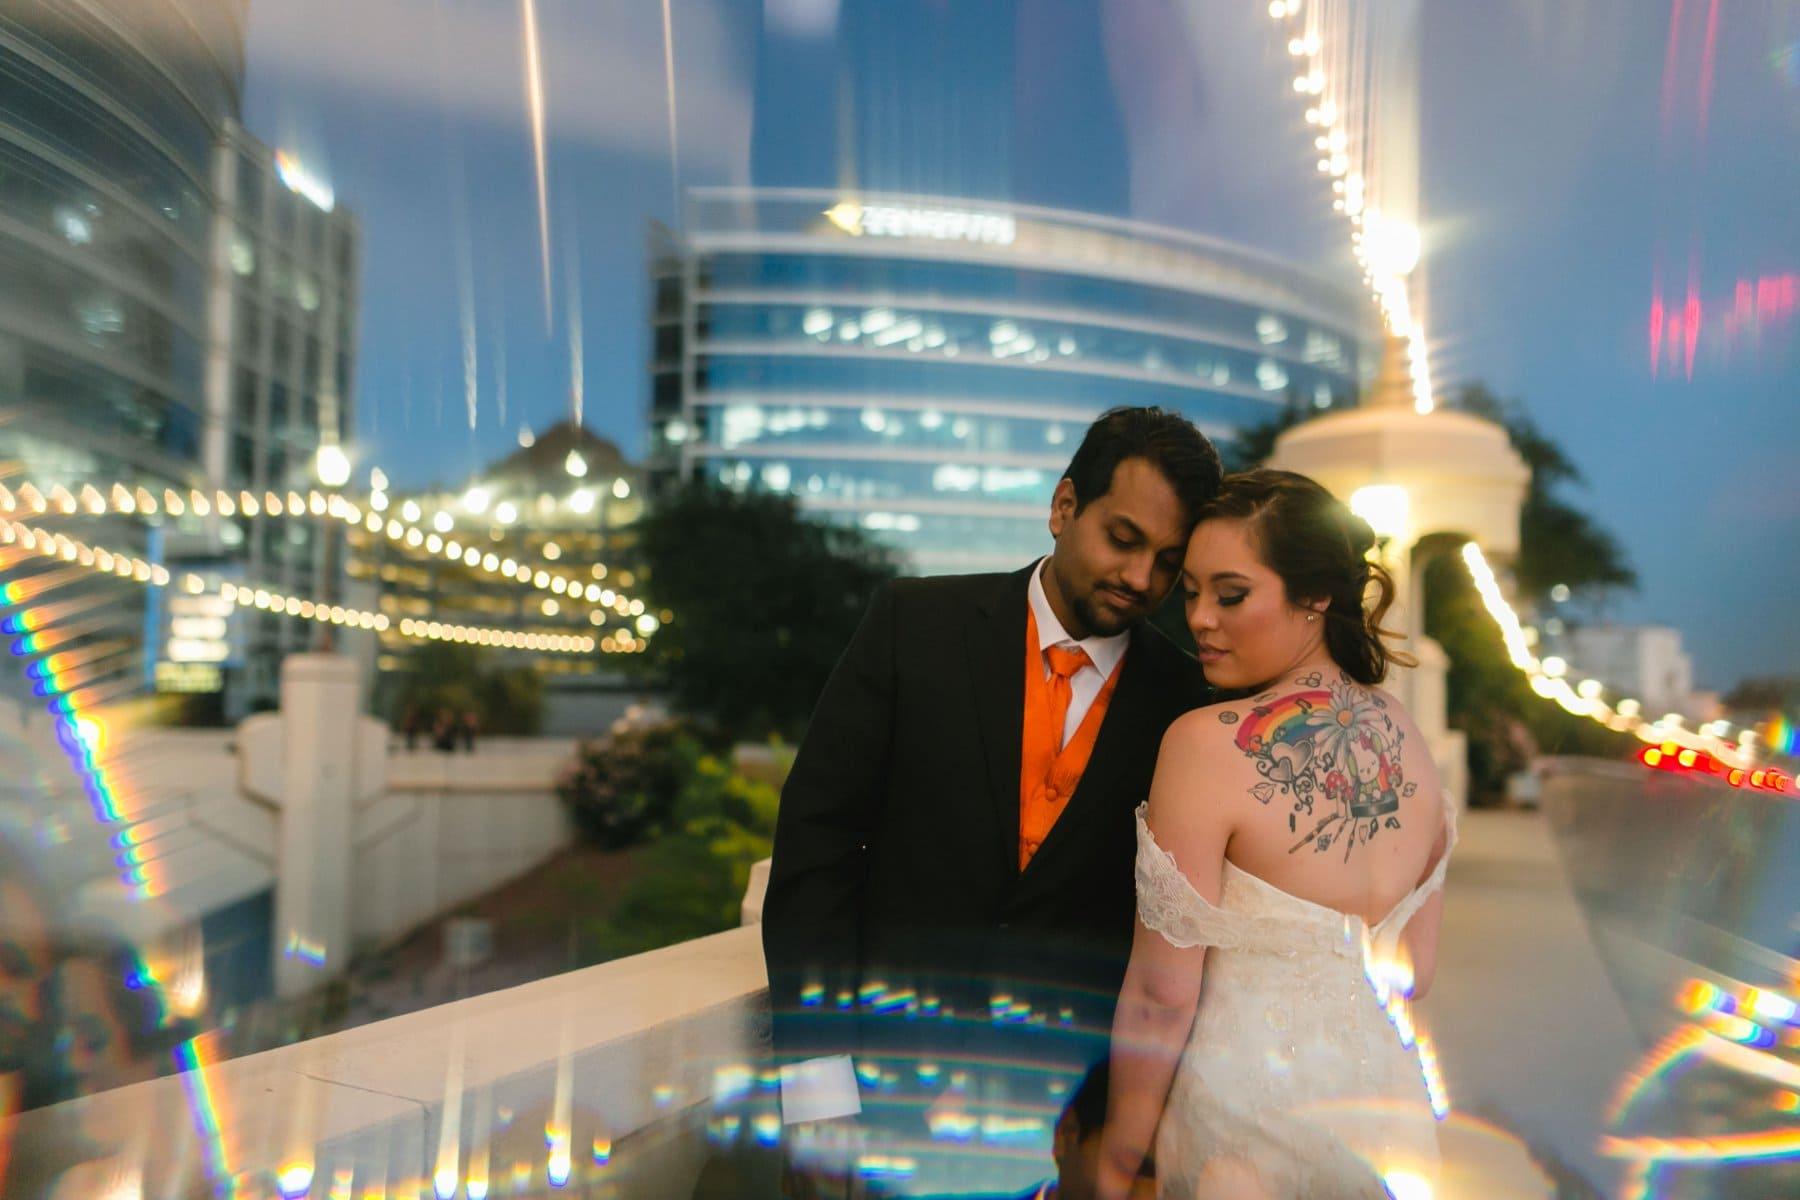 Tempe Town Lake night portraits of bride & groom